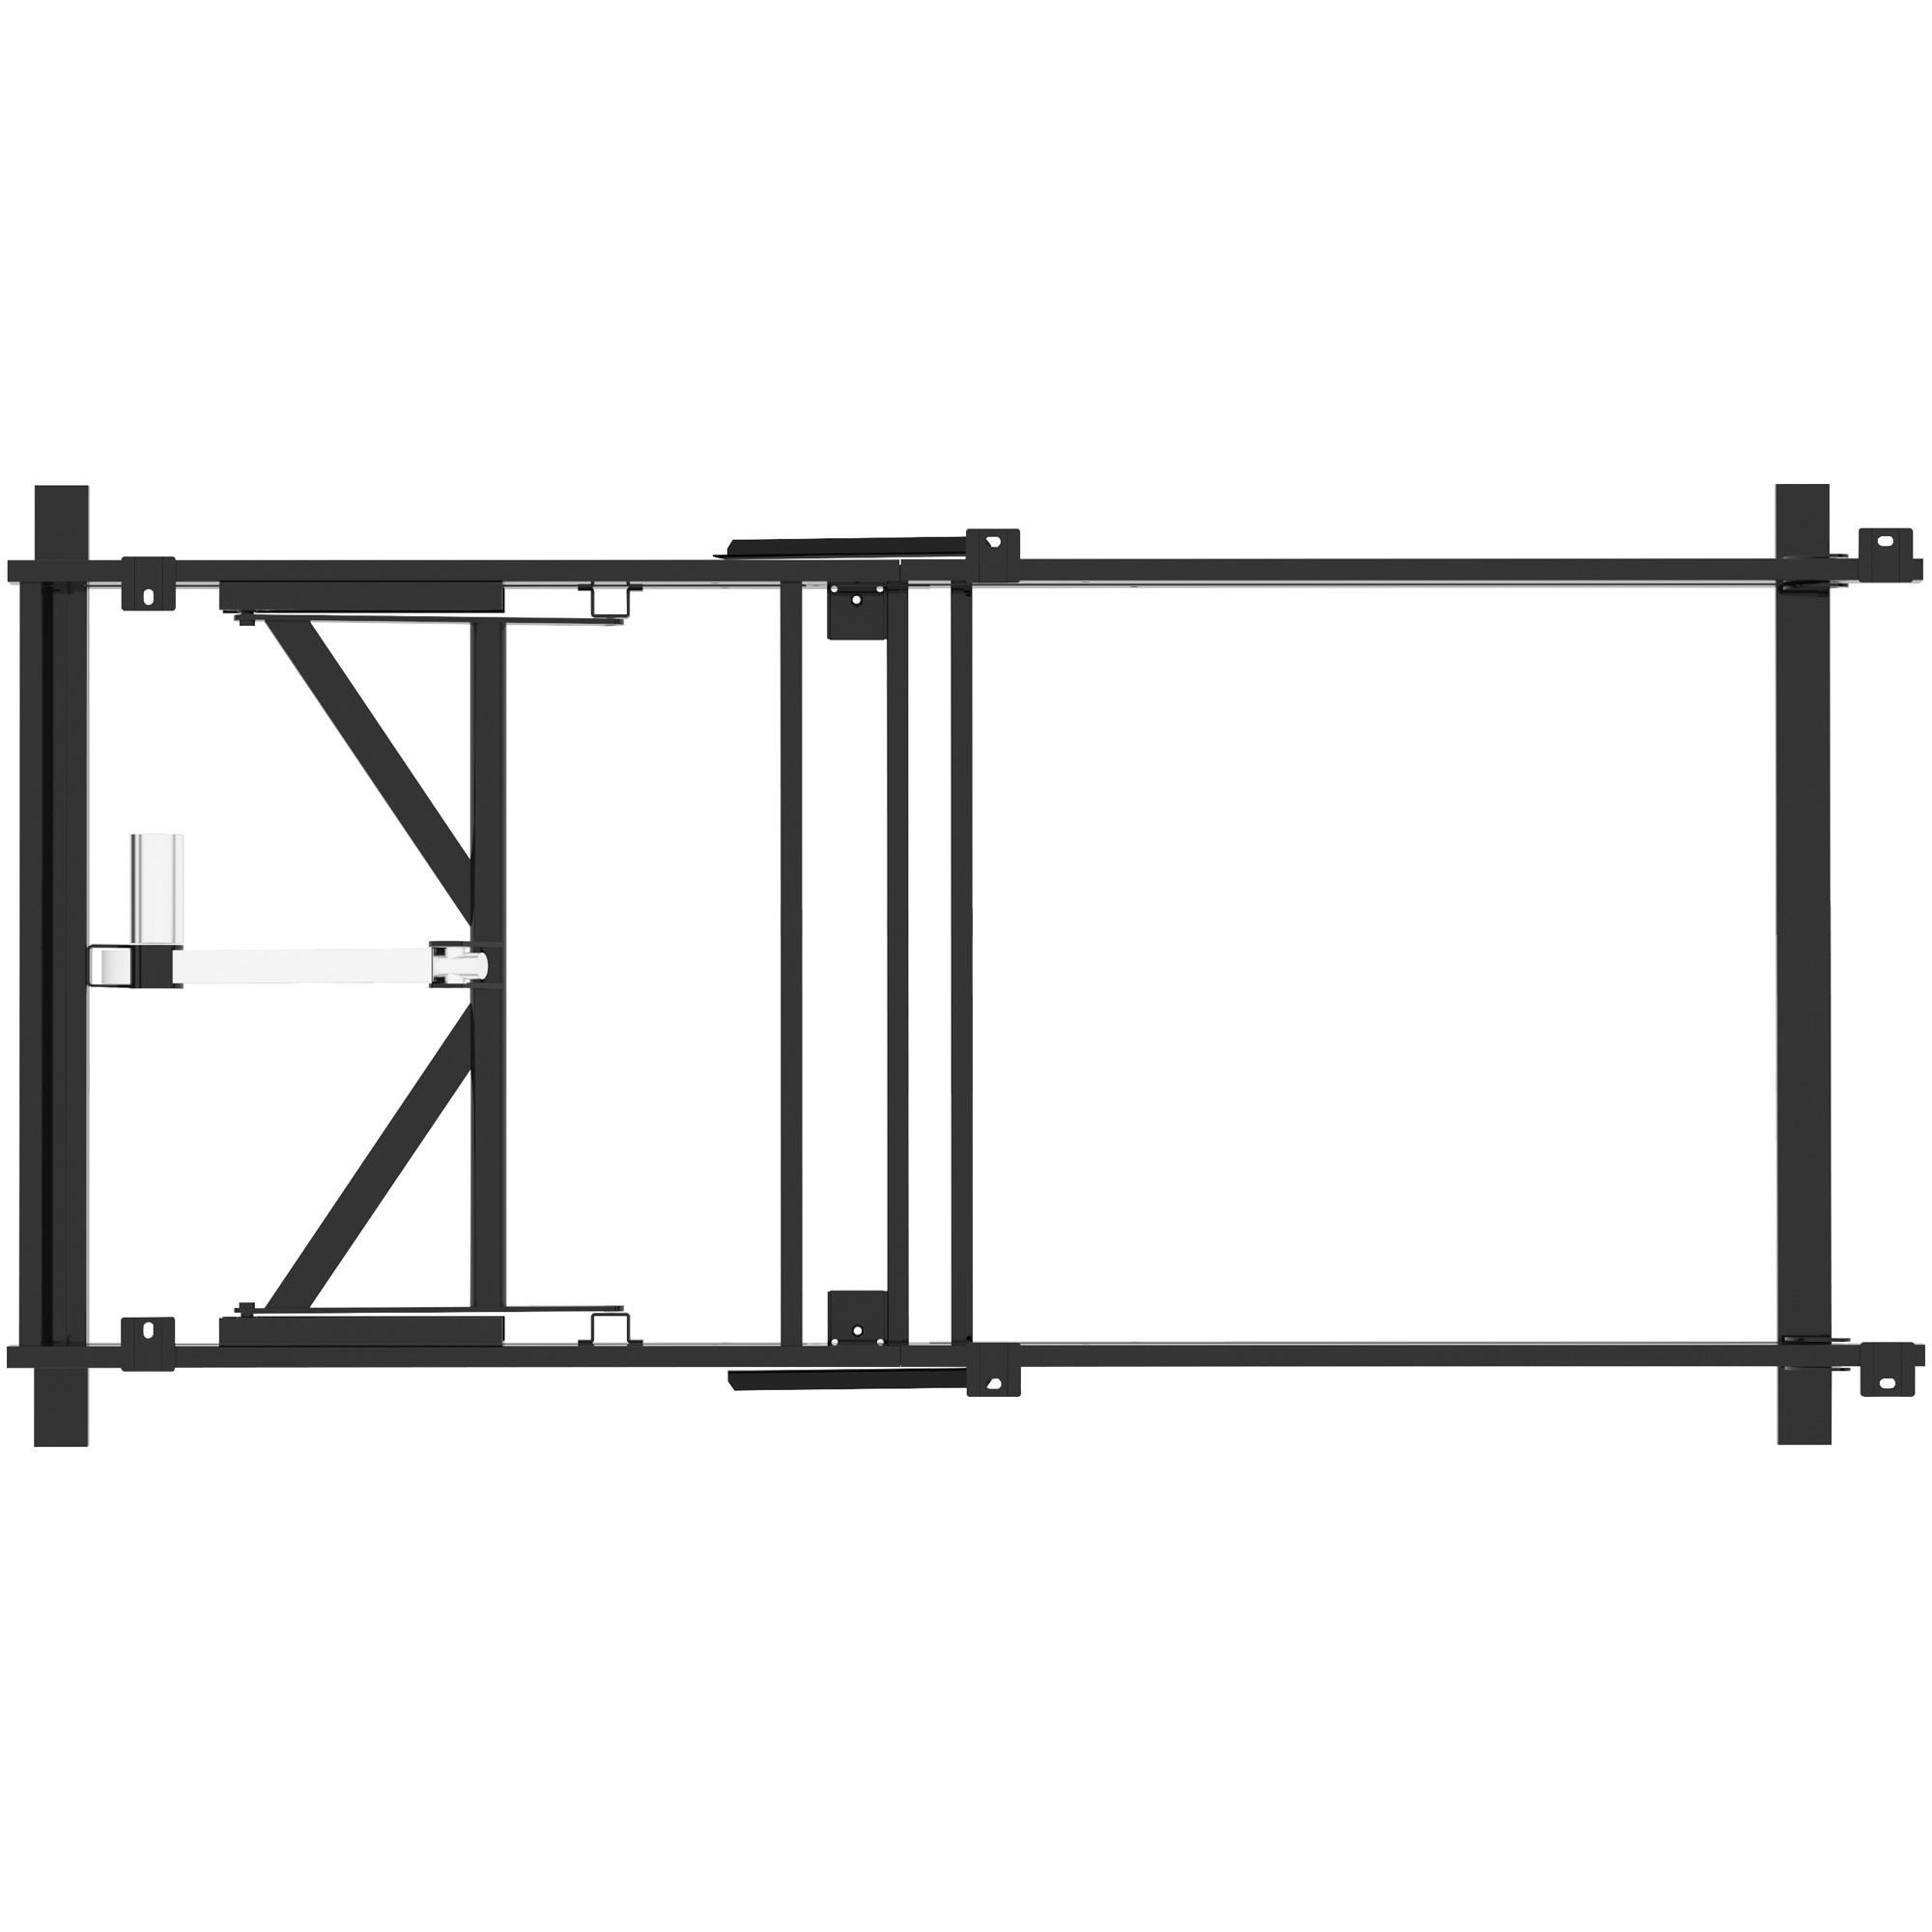 Glideaway | Glide Motion Twin XL Elevation Kit Adjustable Bed Base